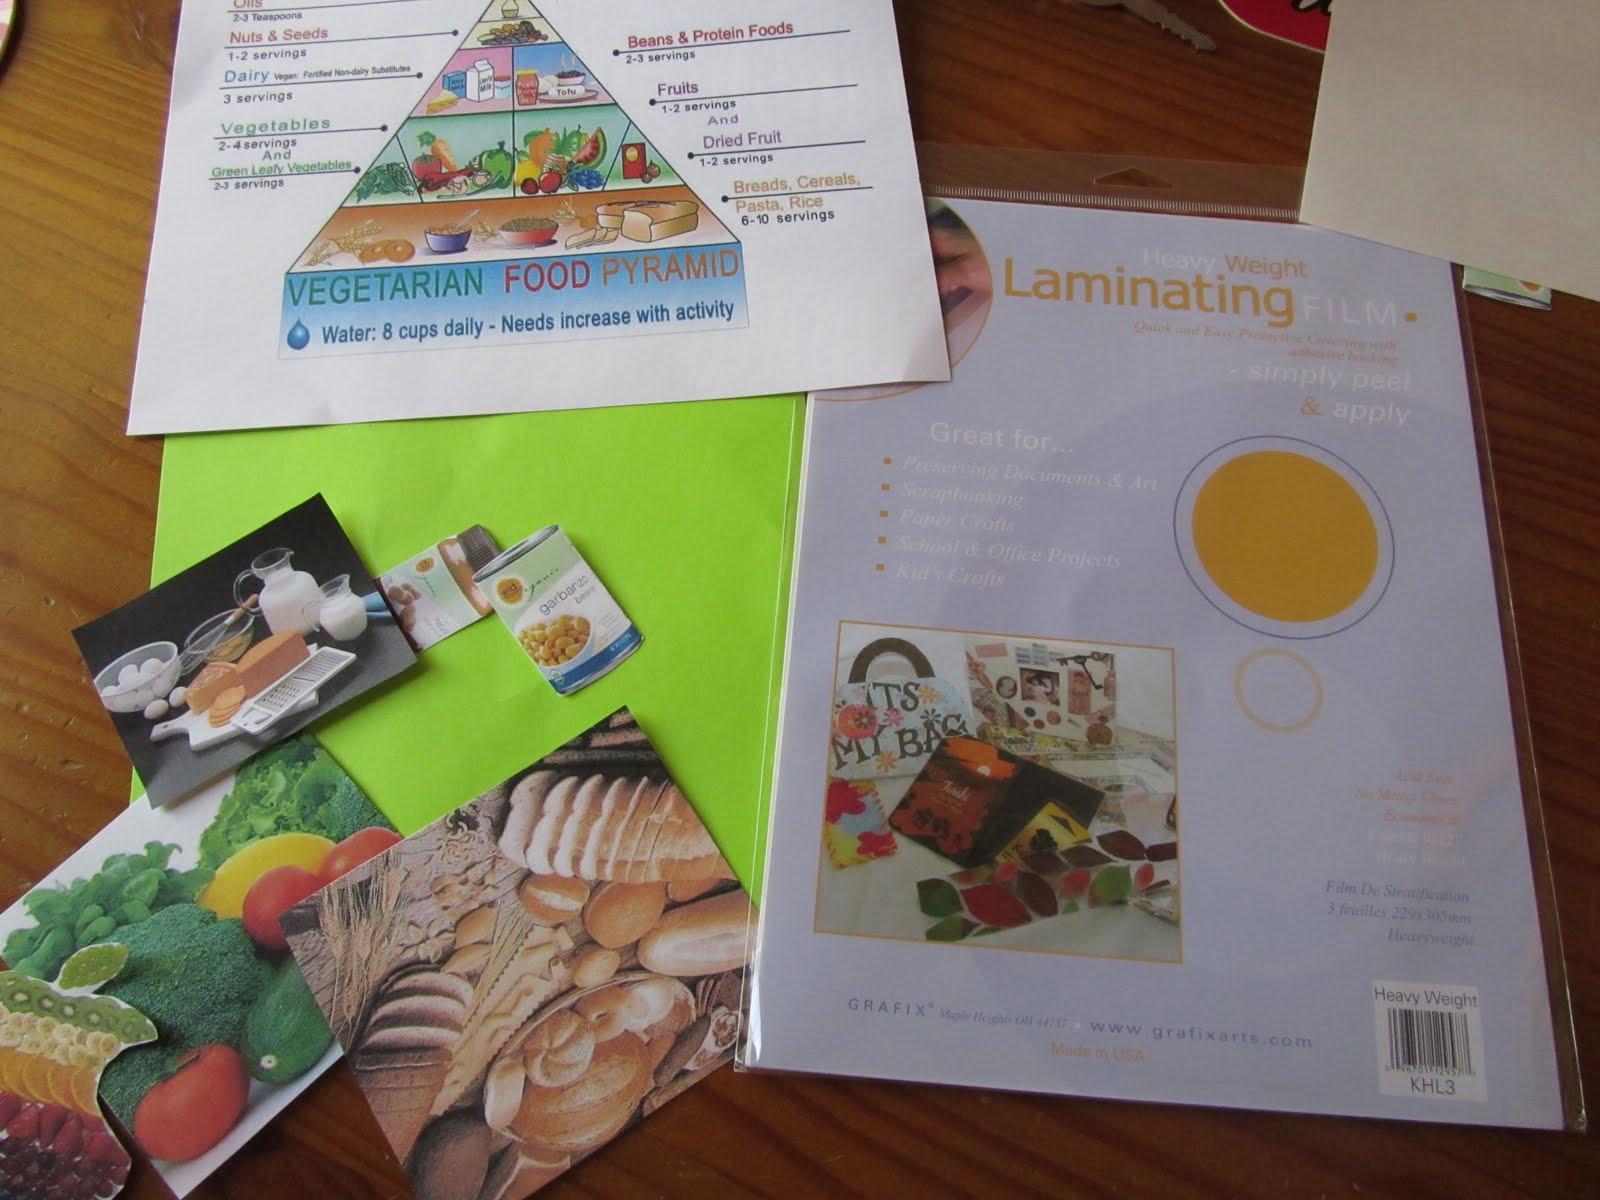 Food Pyramid Crafts For Preschoolers